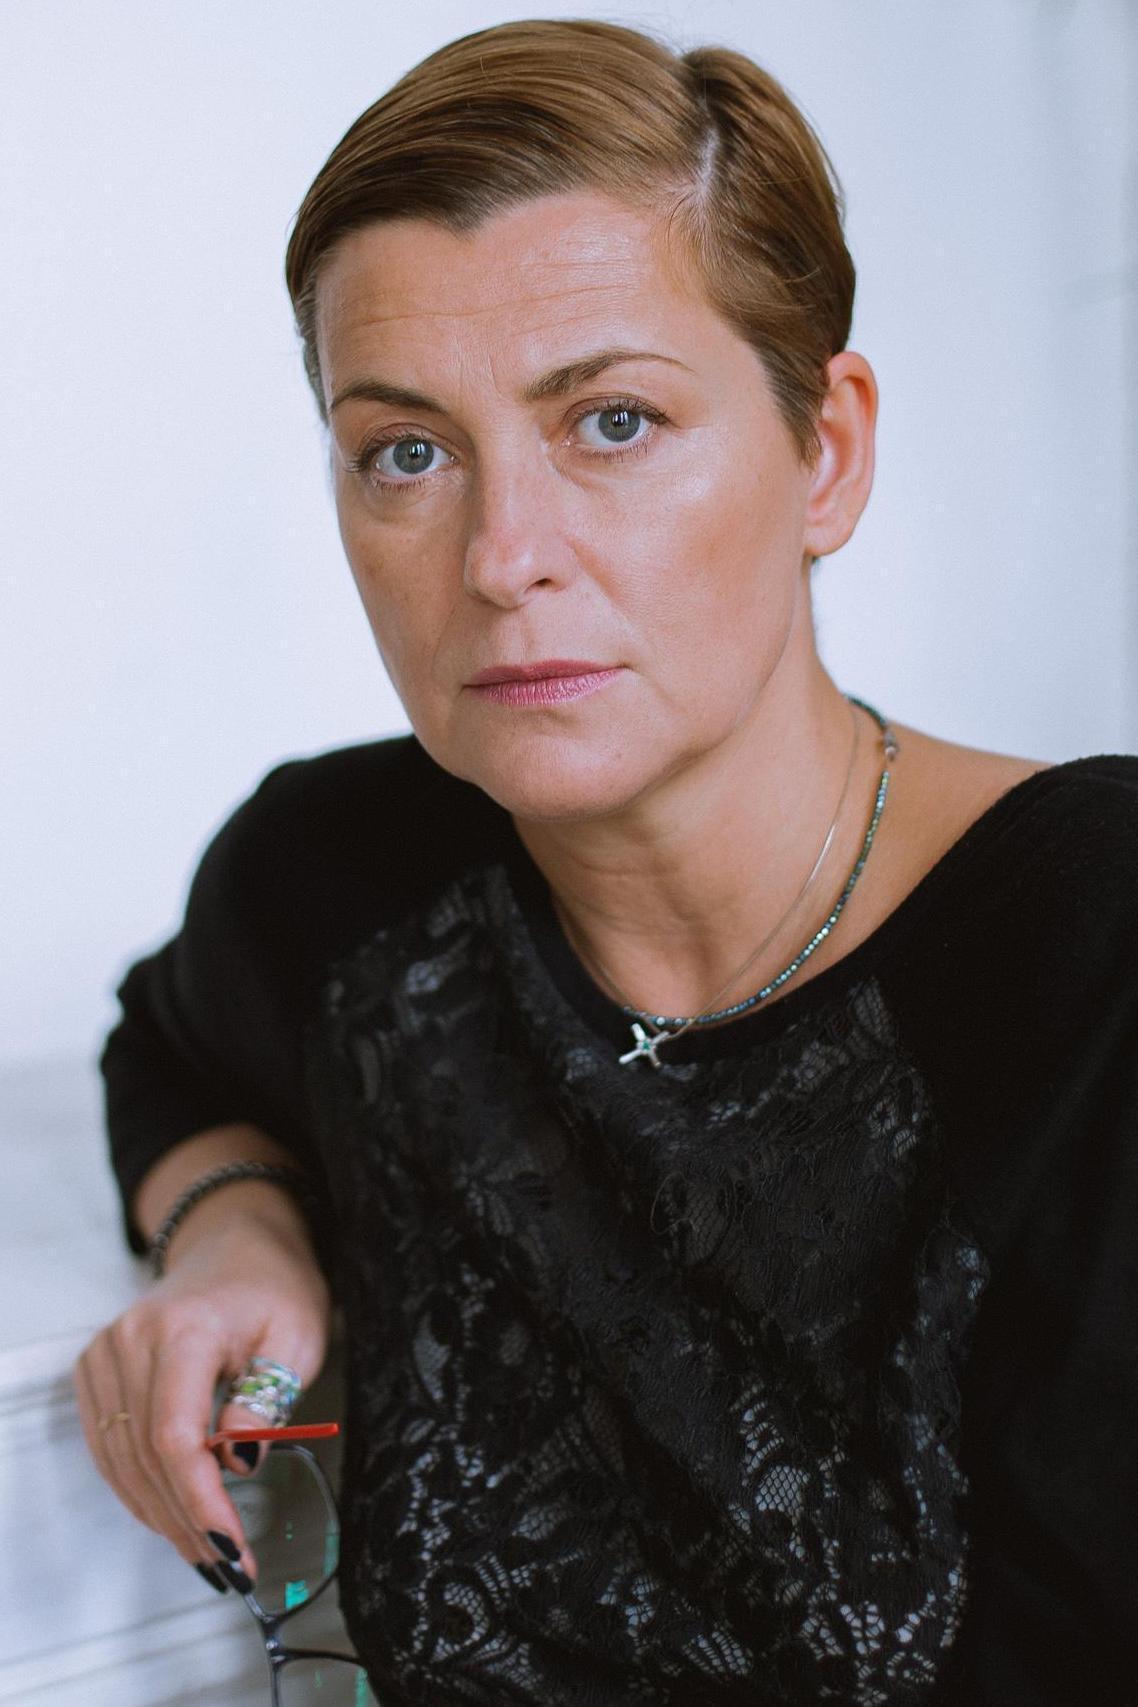 Юлия яблонская актриса личная жизнь муж фото